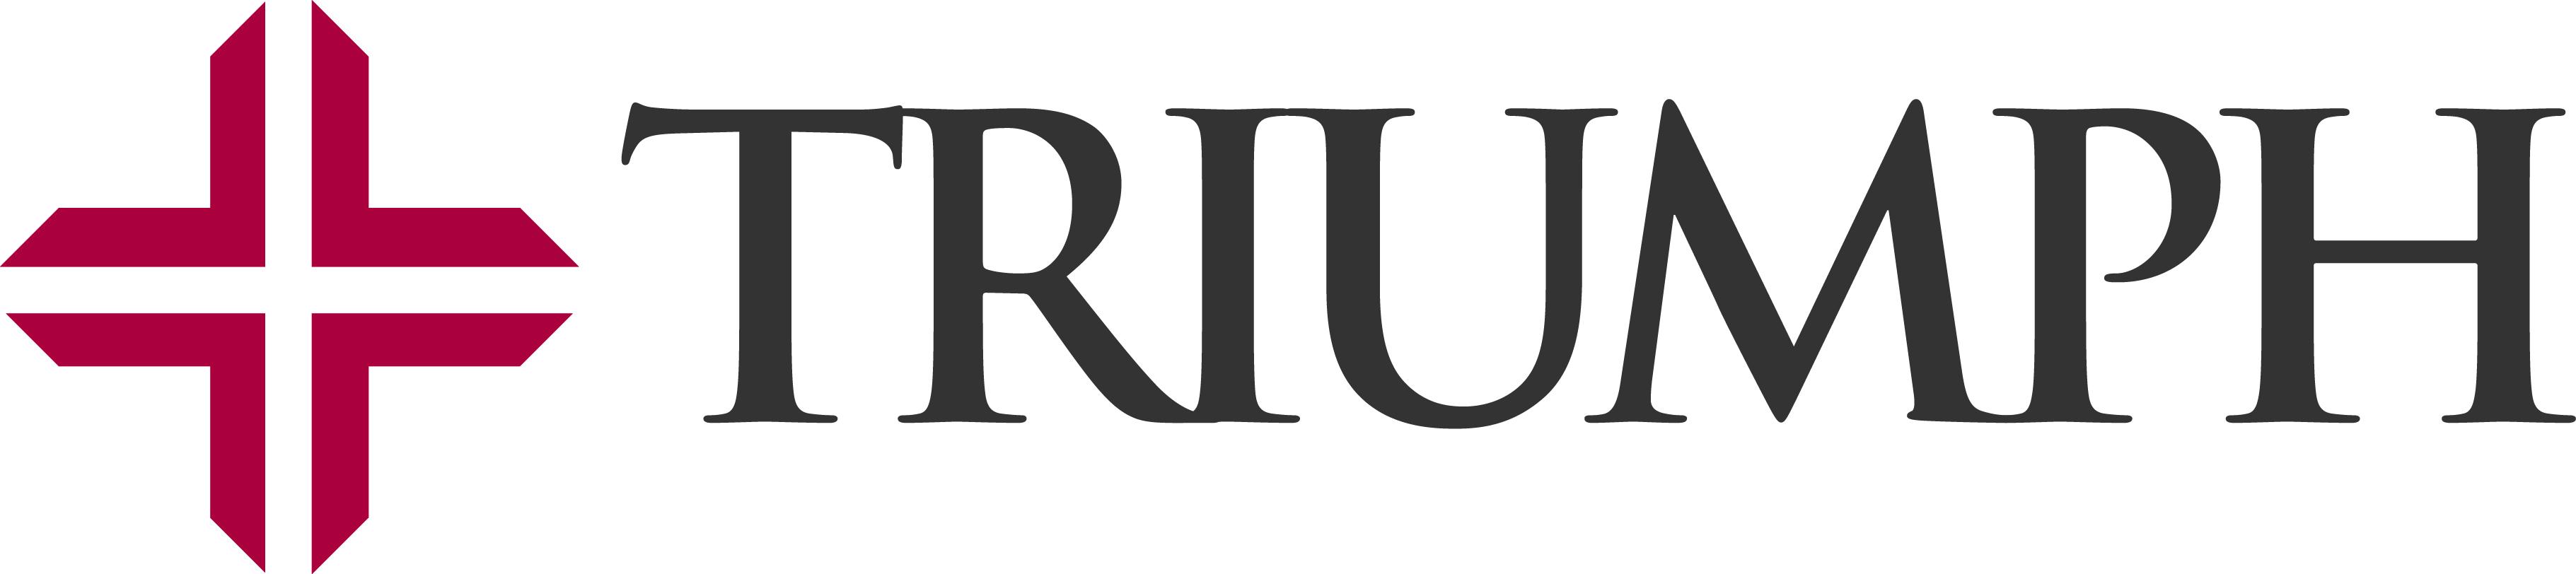 Triumph Bancorp logo